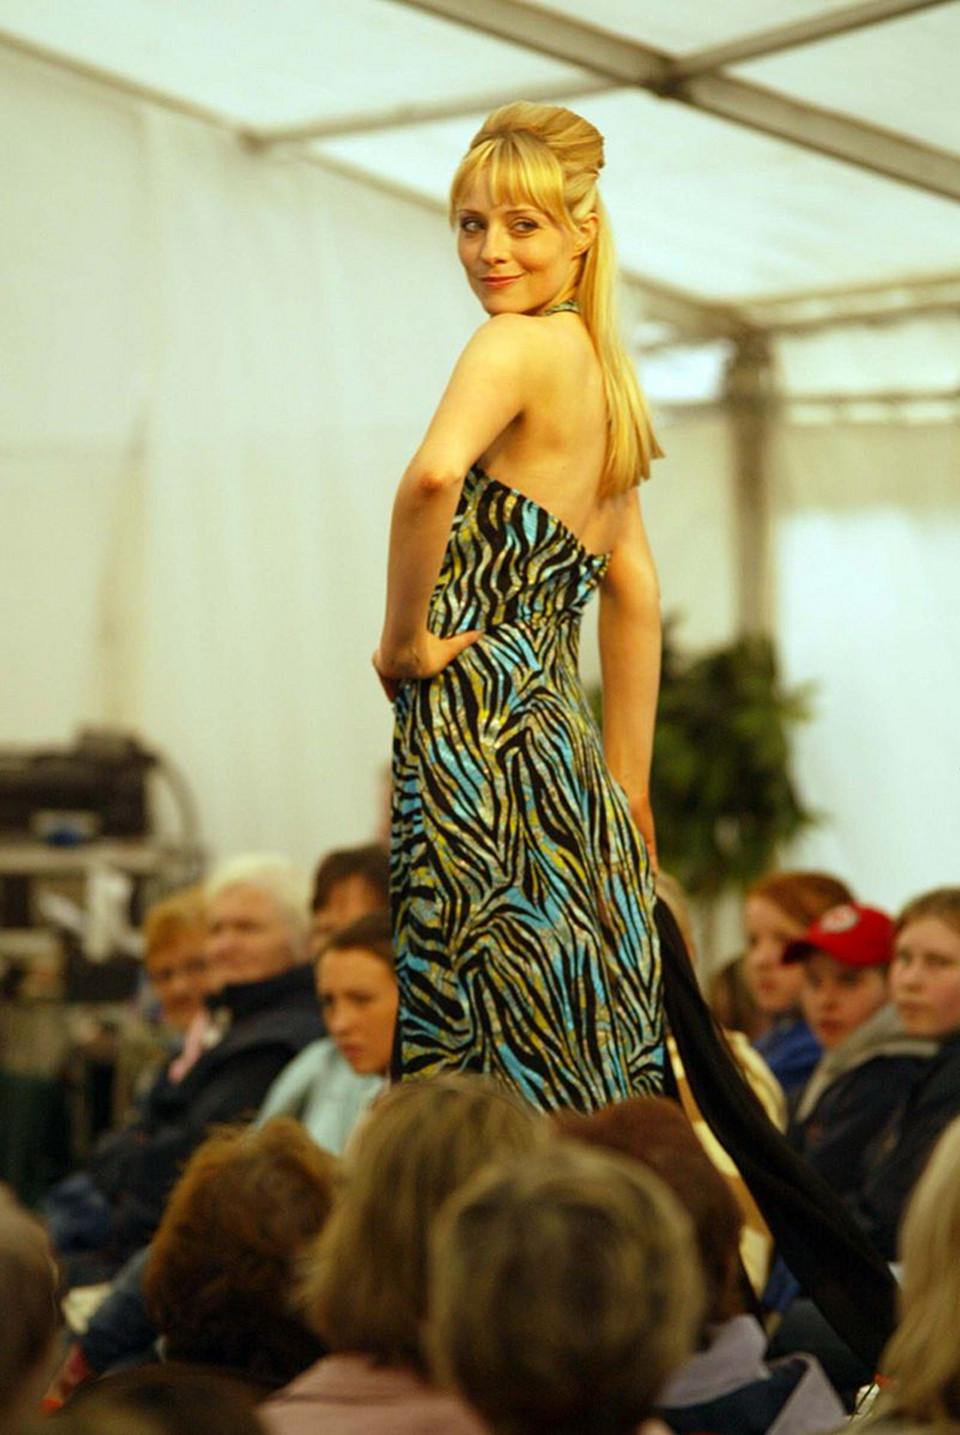 female model fashion show dress